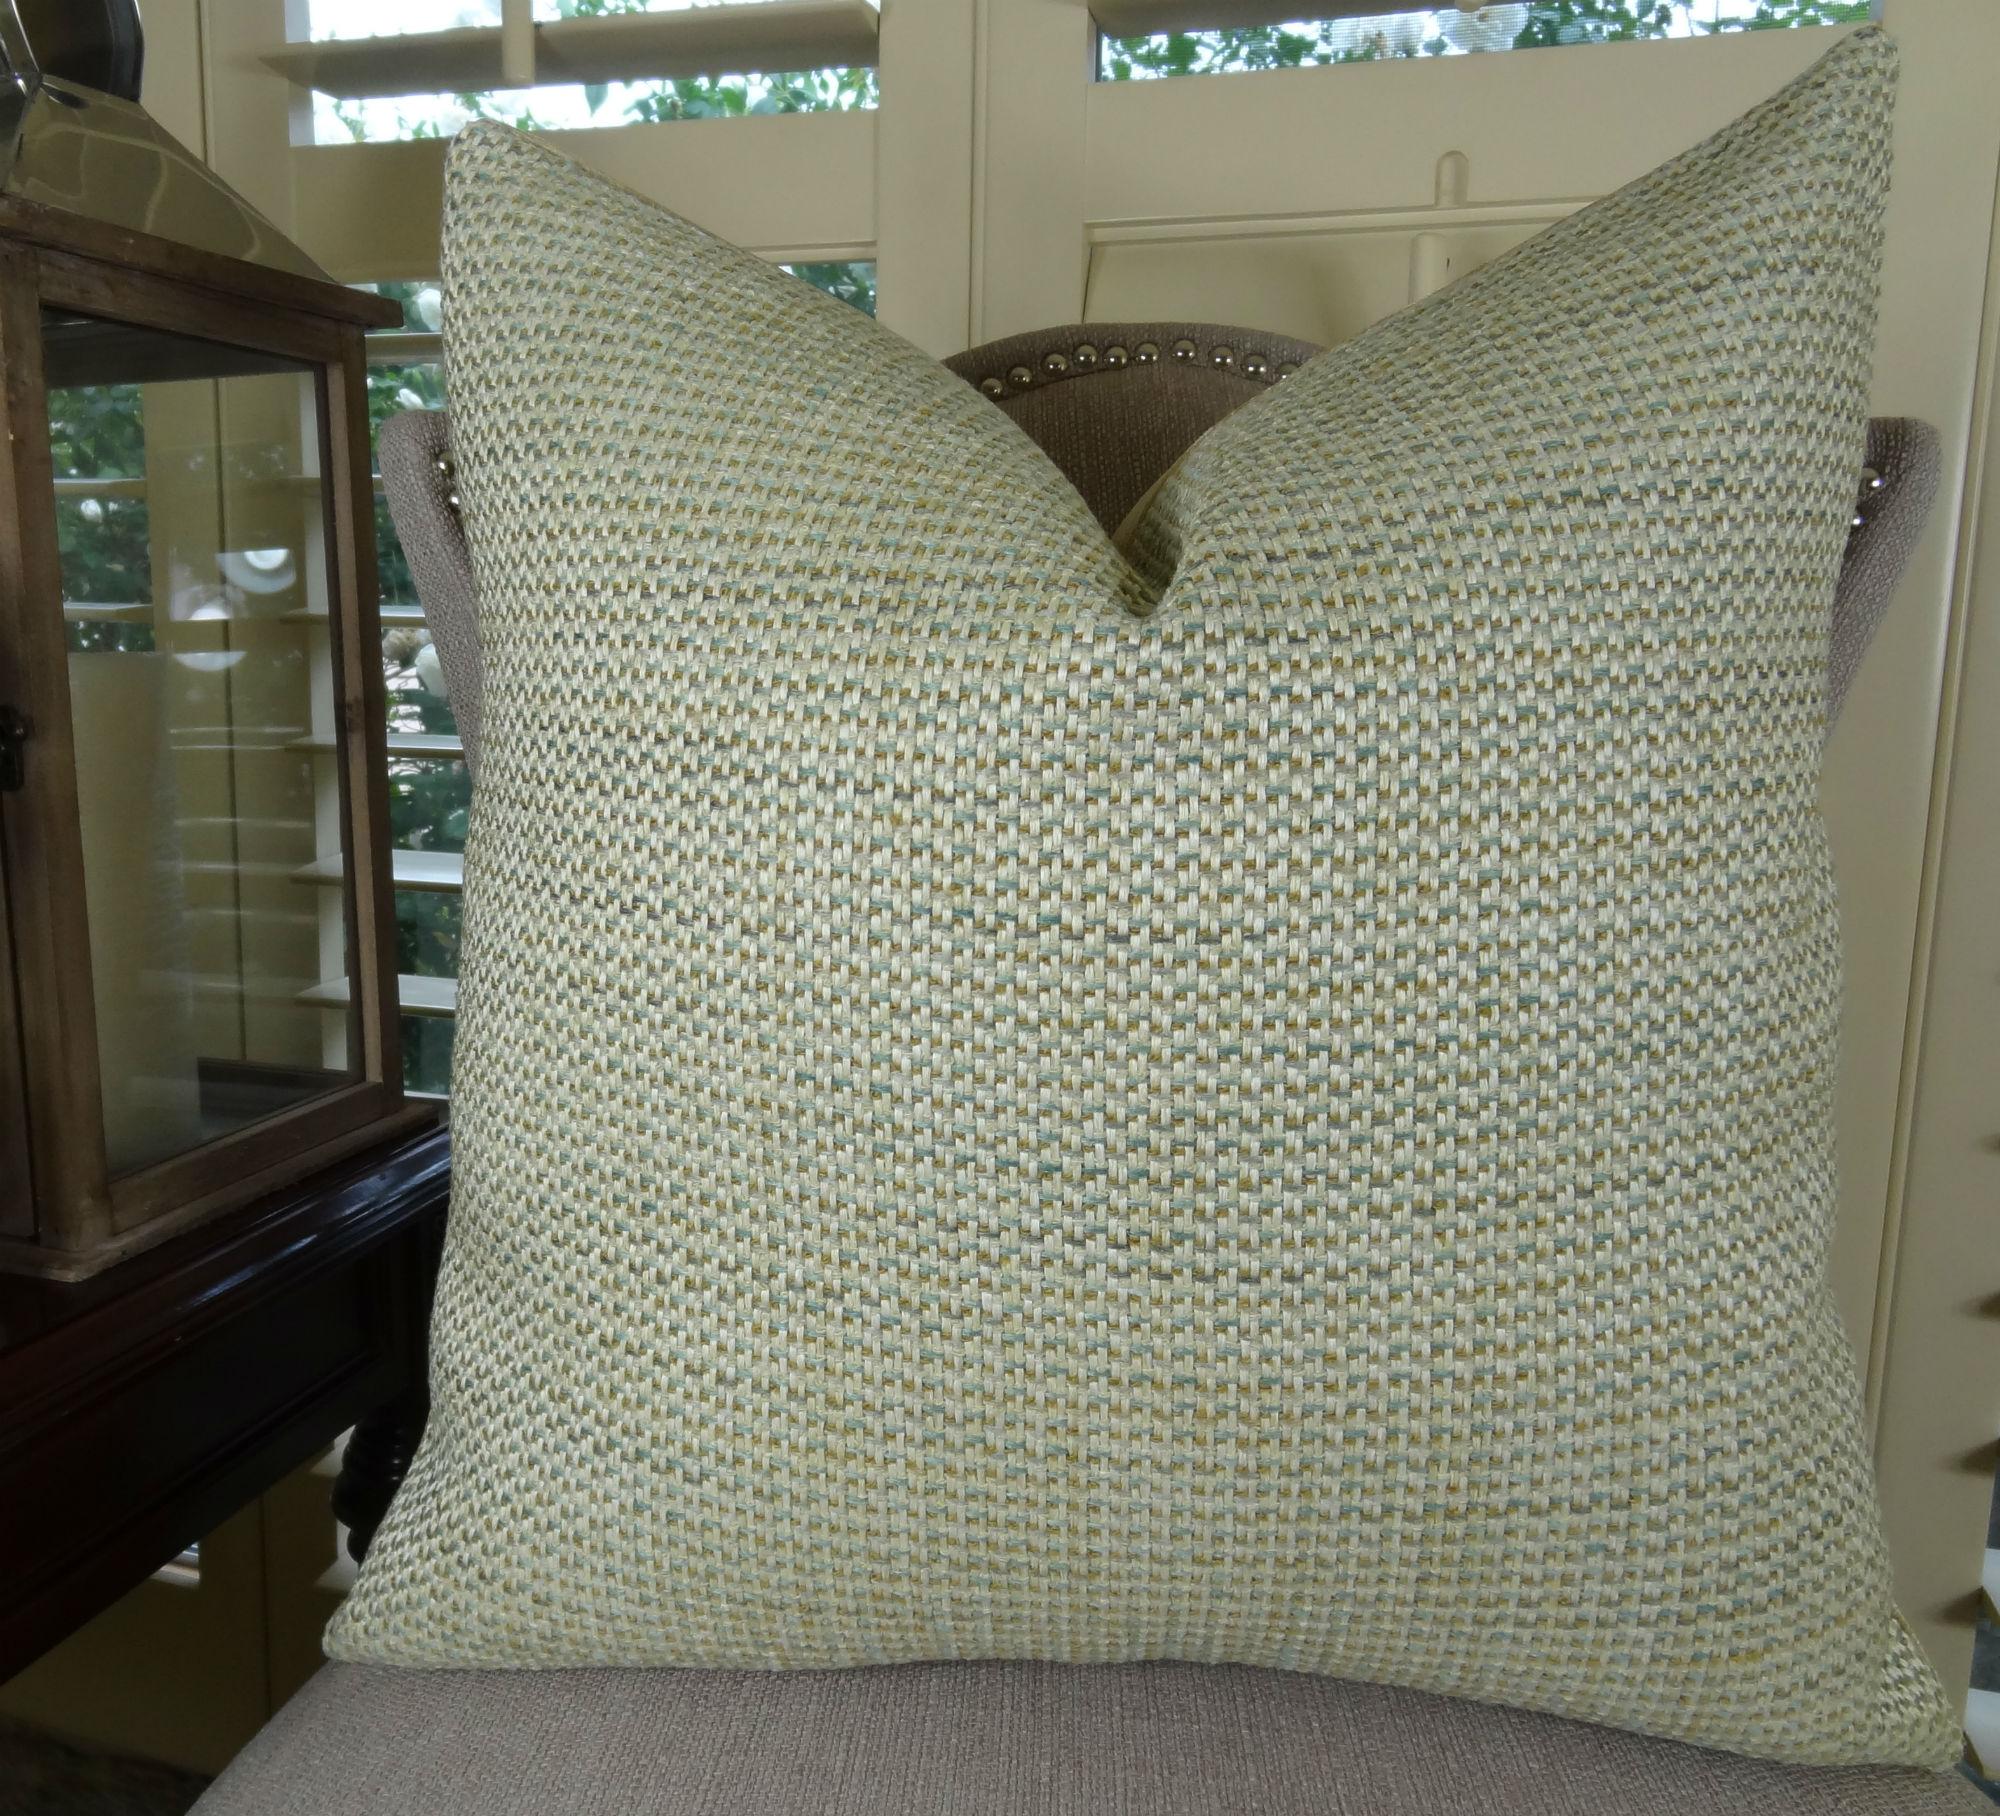 20 X 20 Luxury Decorative Throw Pillow Cover Light Green Tan